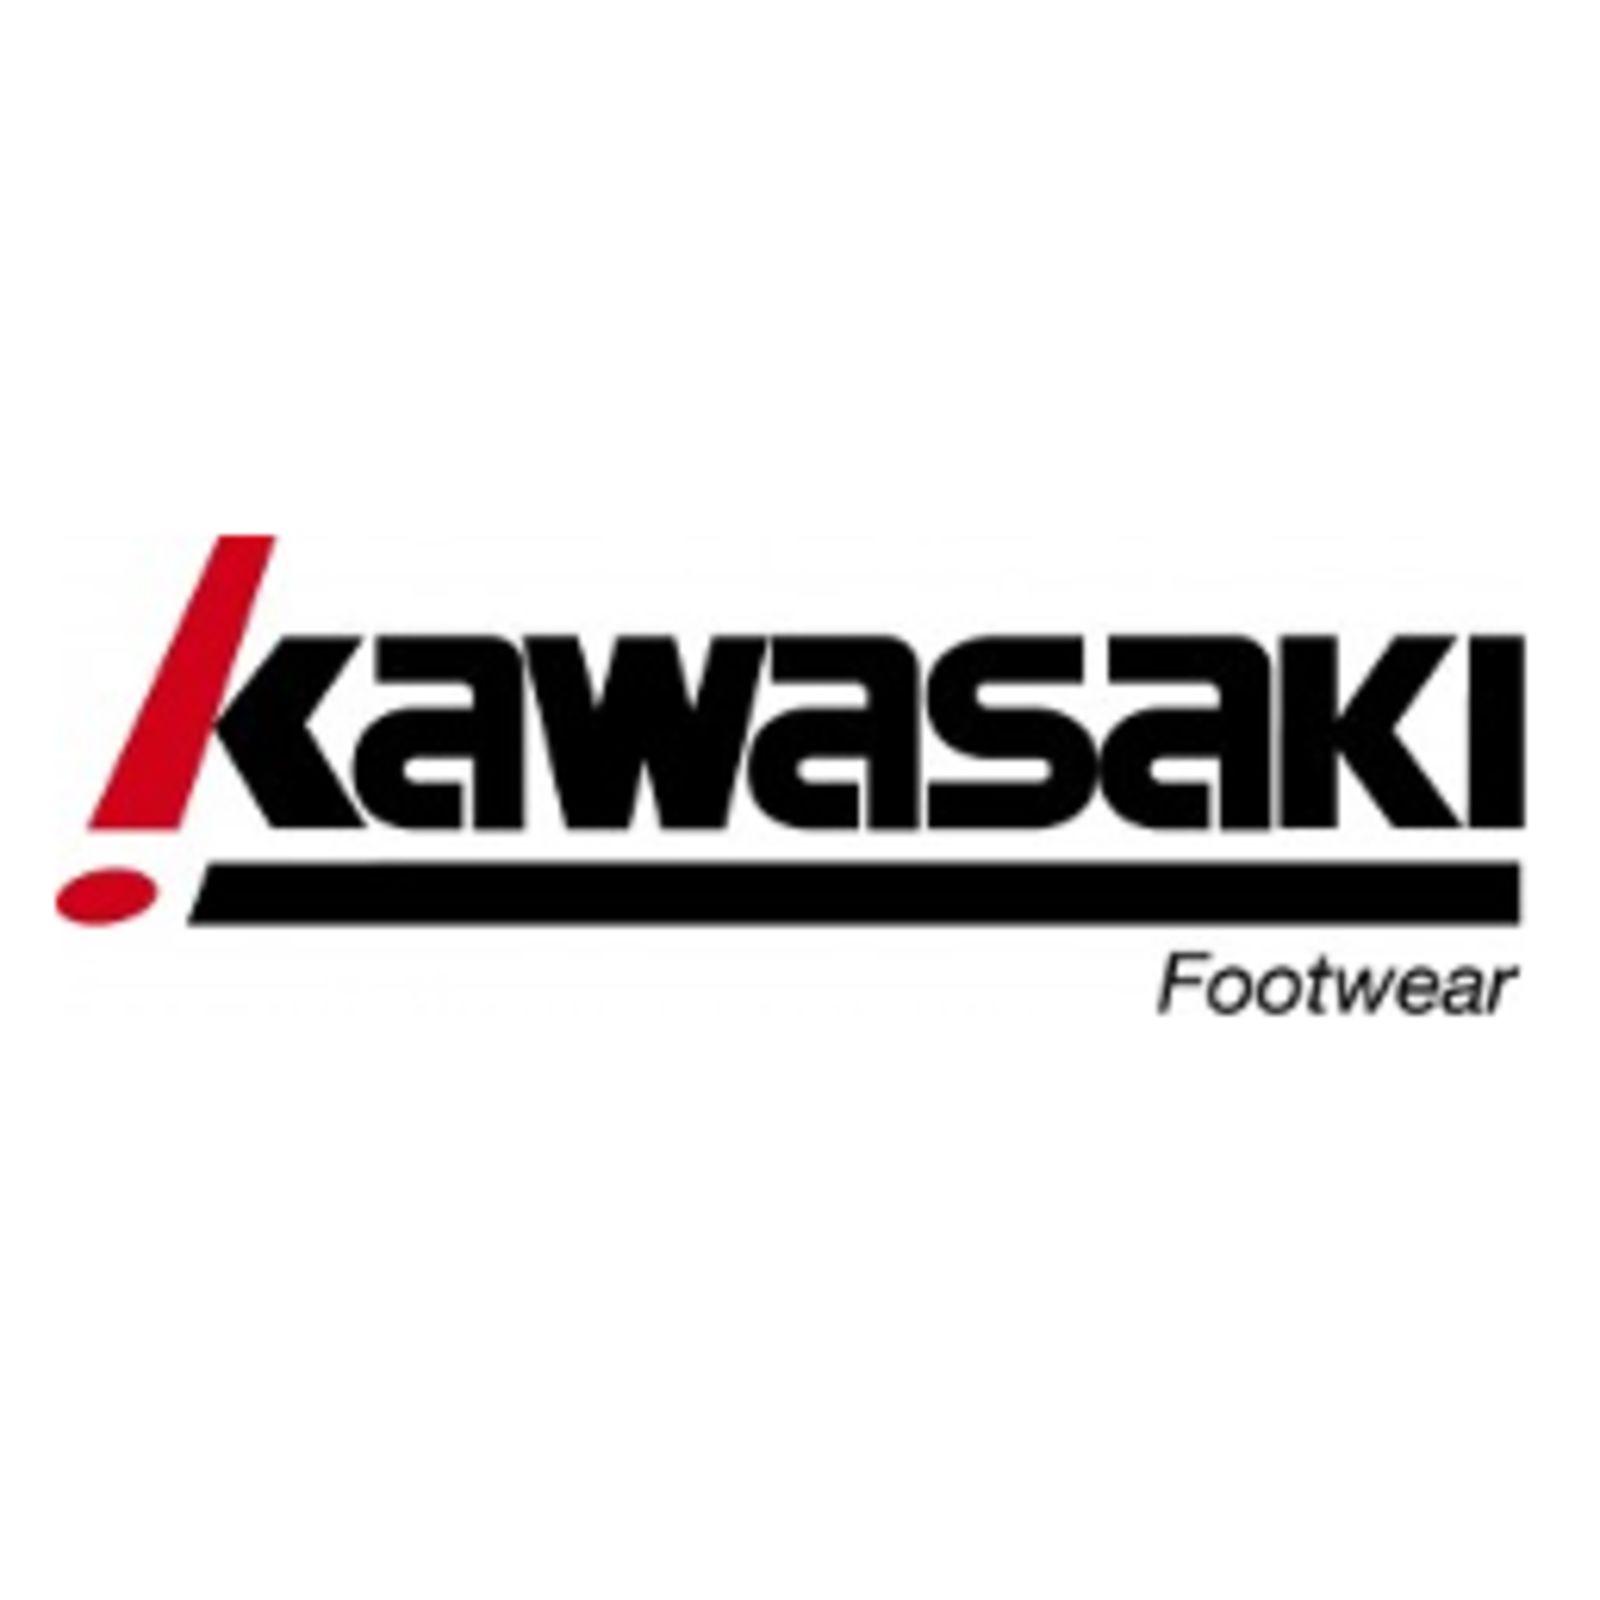 kawasaki footwear